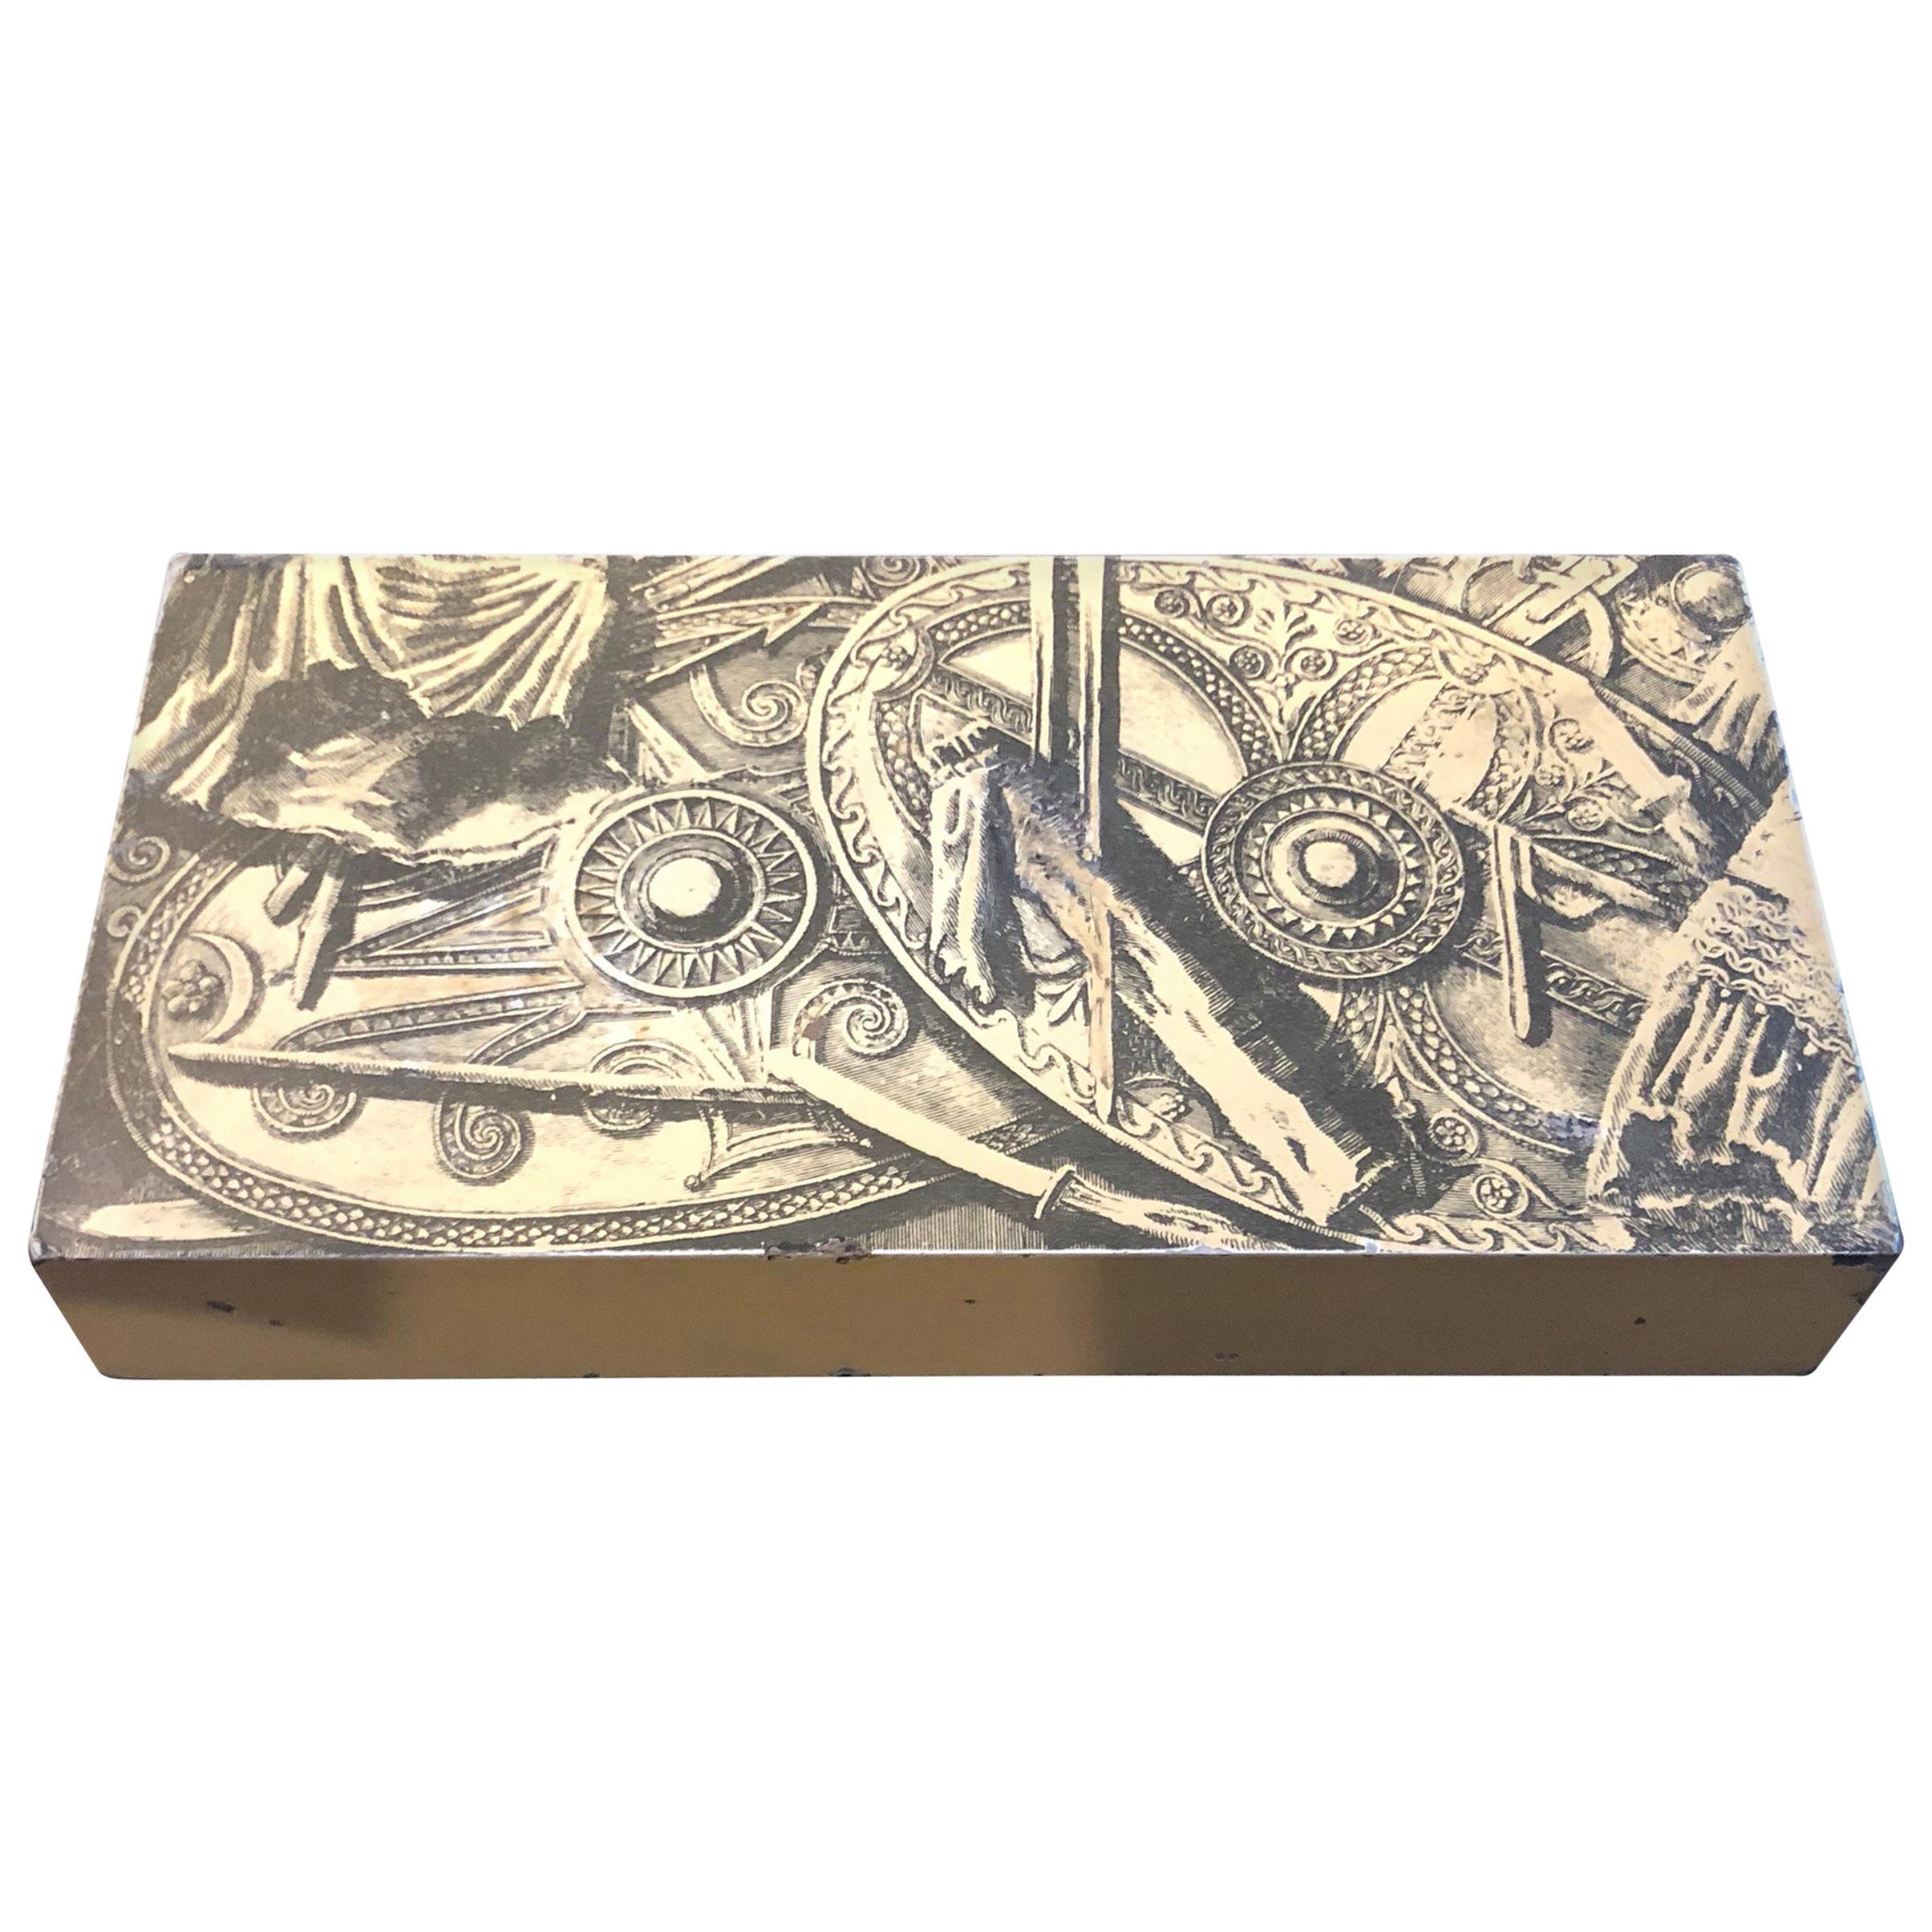 Piero Fornasetti Mid-Century Modern Italian Cigarette Box, 1950